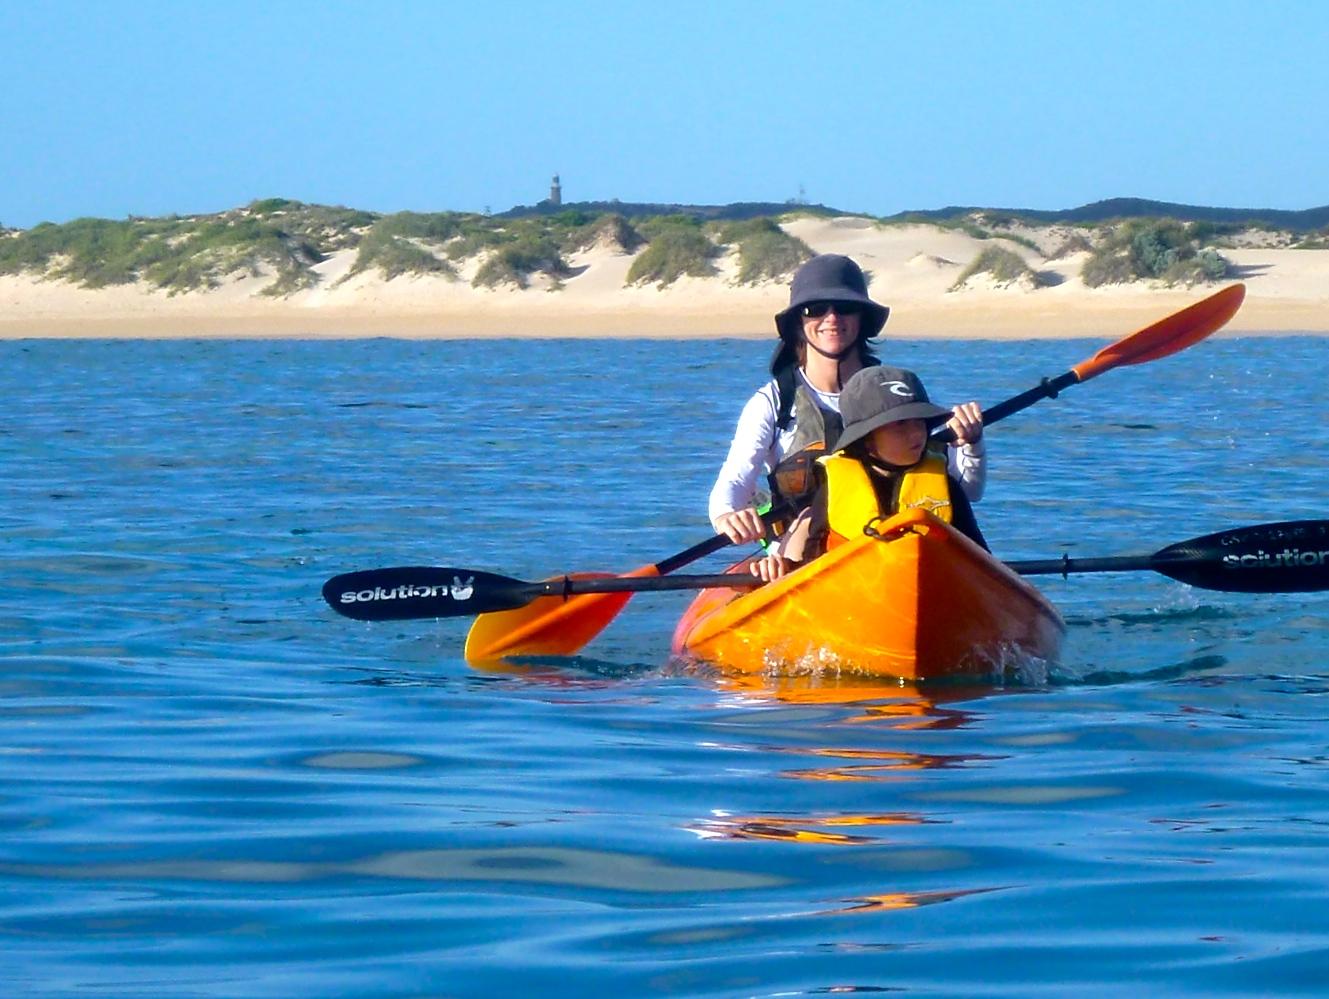 Arvo Cruiser, sea kayak, snorkel, Exmouth, Western Australia, Ningaloo Reef, Exmouth Adventure Co, eco tour, kayak, Ningaloo Reef, Coral Coast